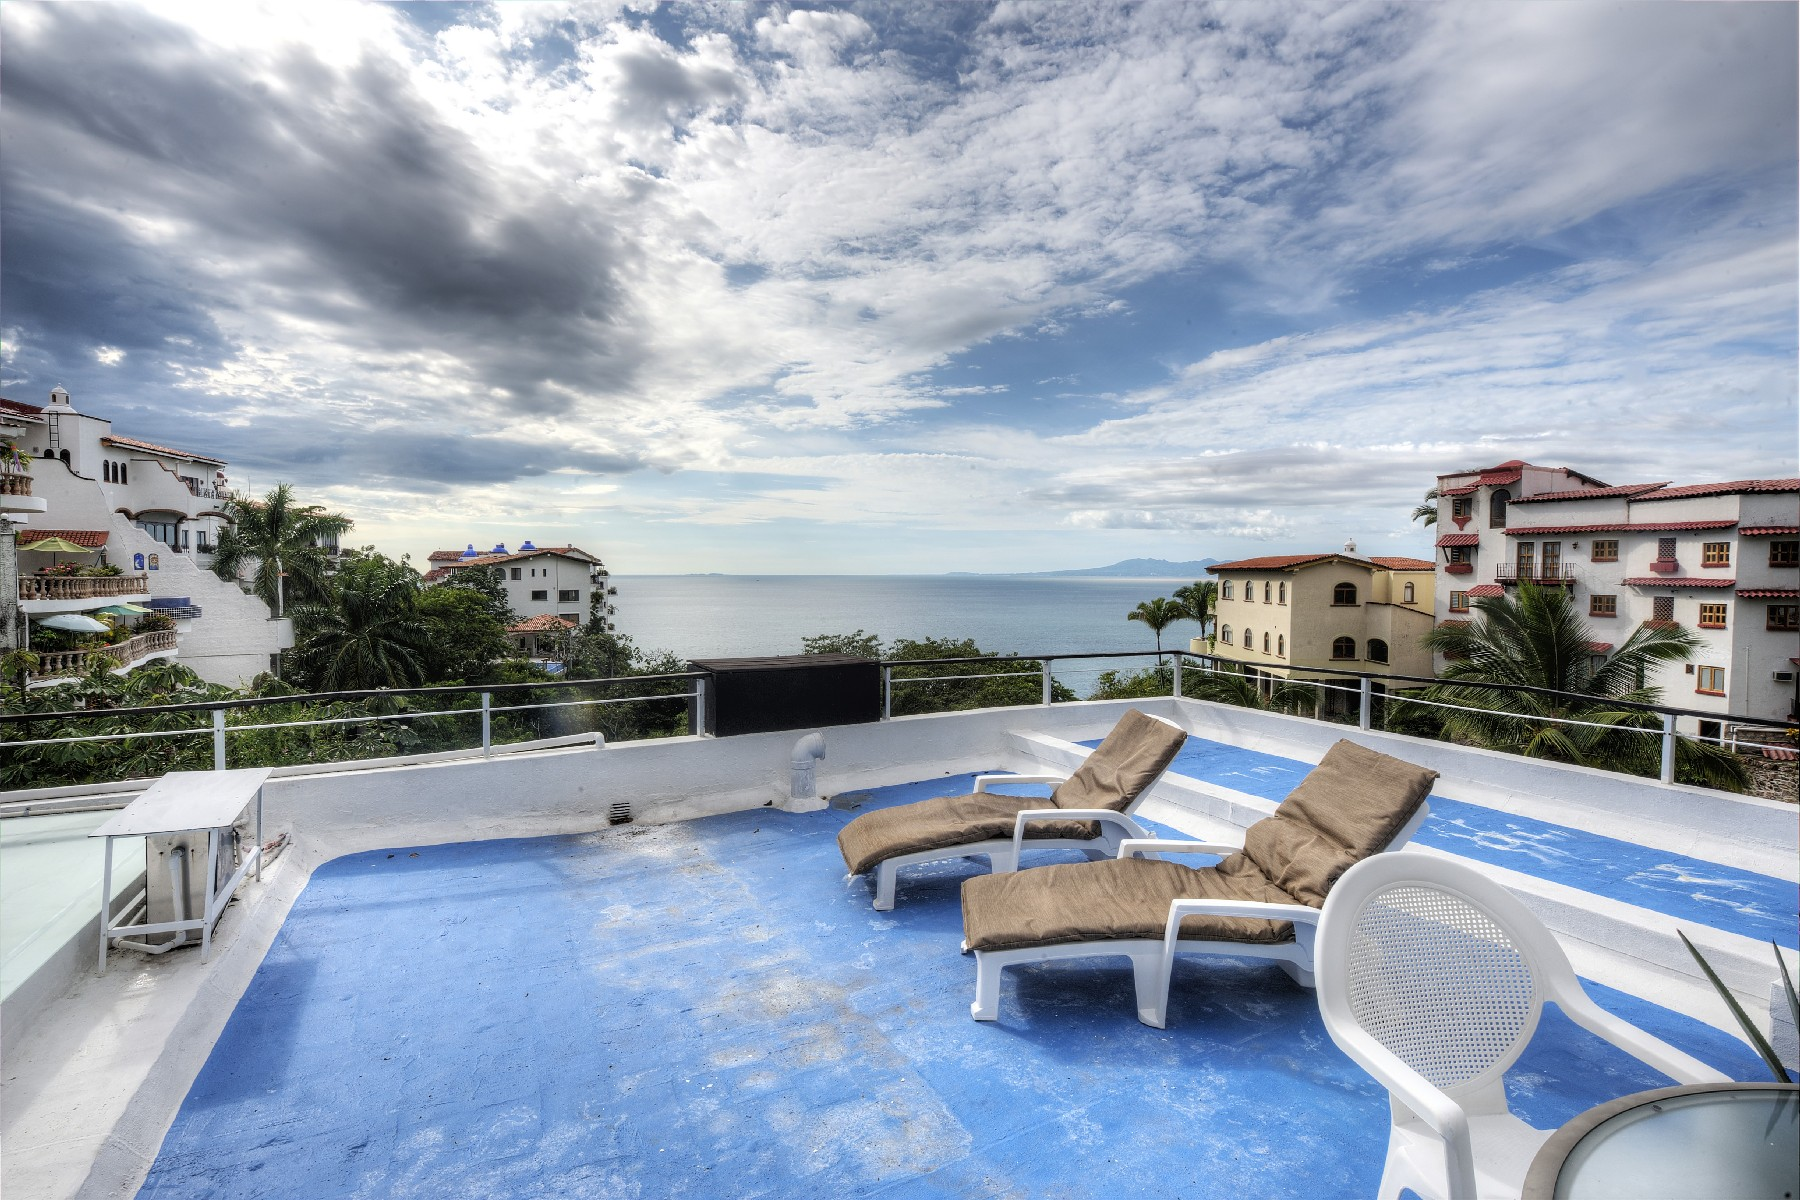 Single Family Home for Sale at Villa Enigma Puerto Vallarta, Jalisco Mexico